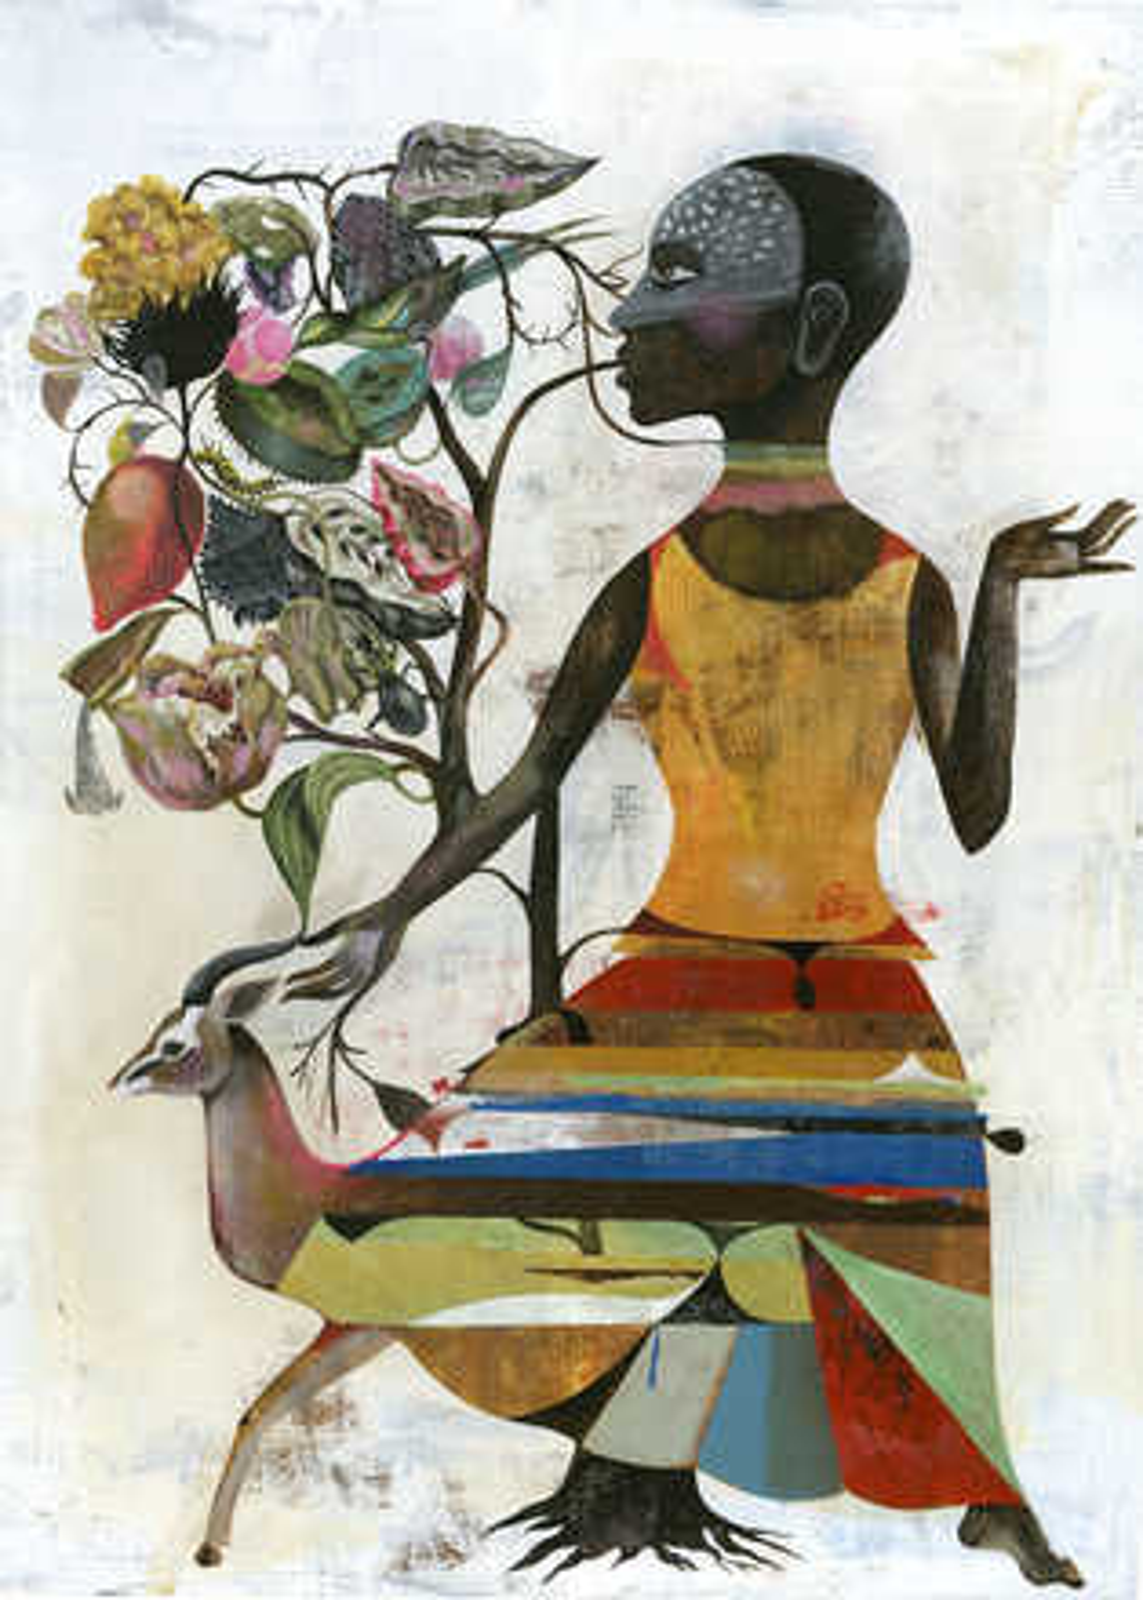 African Dress - Olaf Hajek